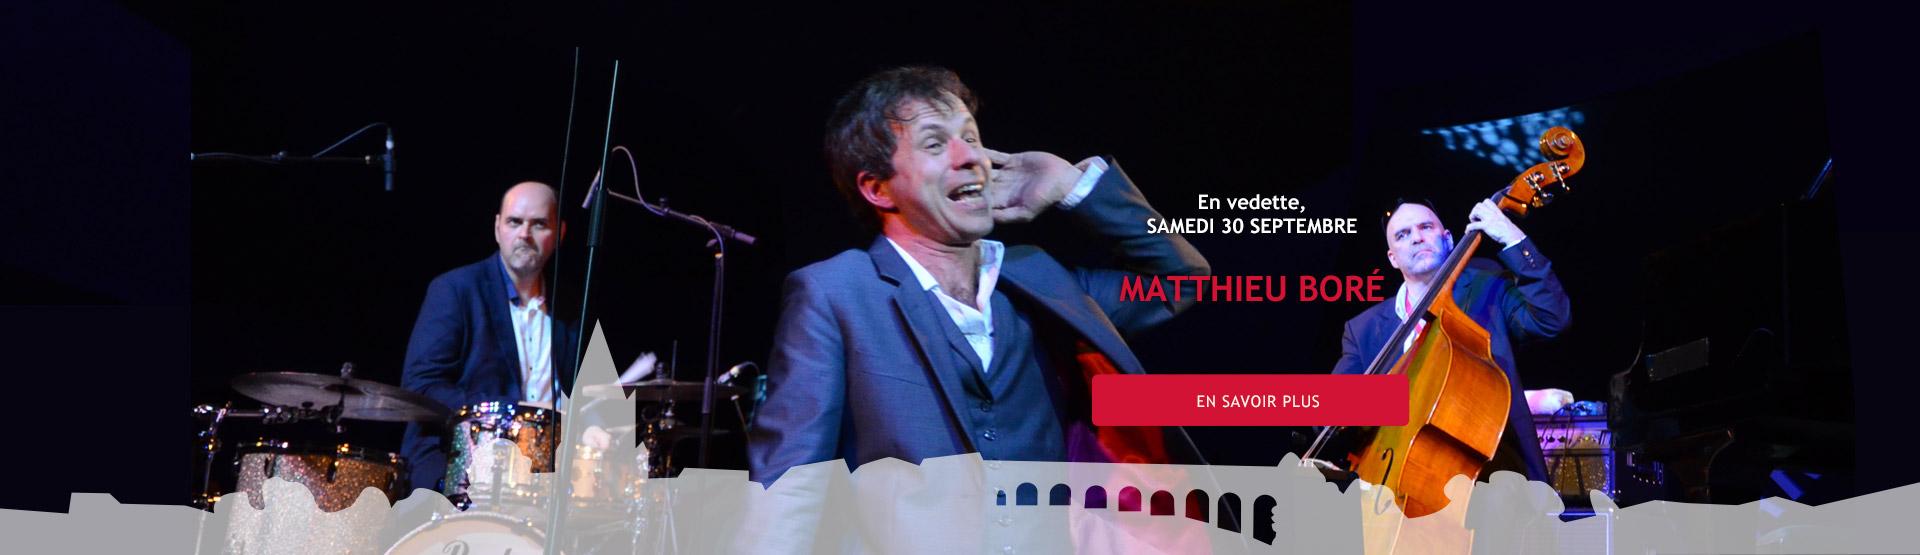 slide5-matthieu-bore-1